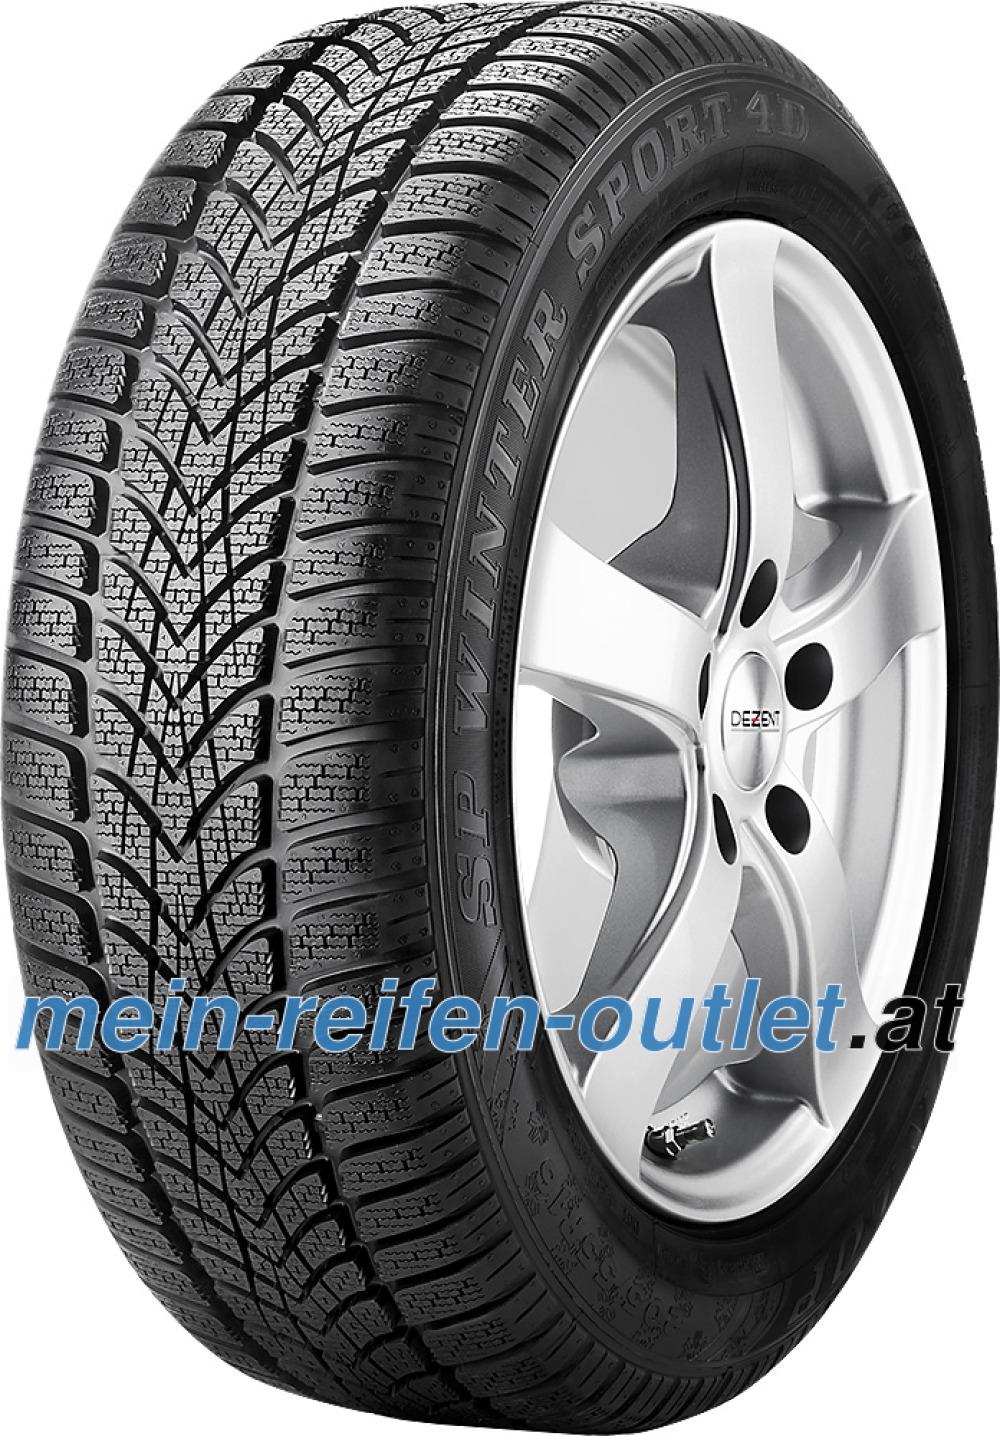 Dunlop SP Winter Sport 4D ( 235/50 R18 97V , MO, mit Felgenschutz (MFS) )